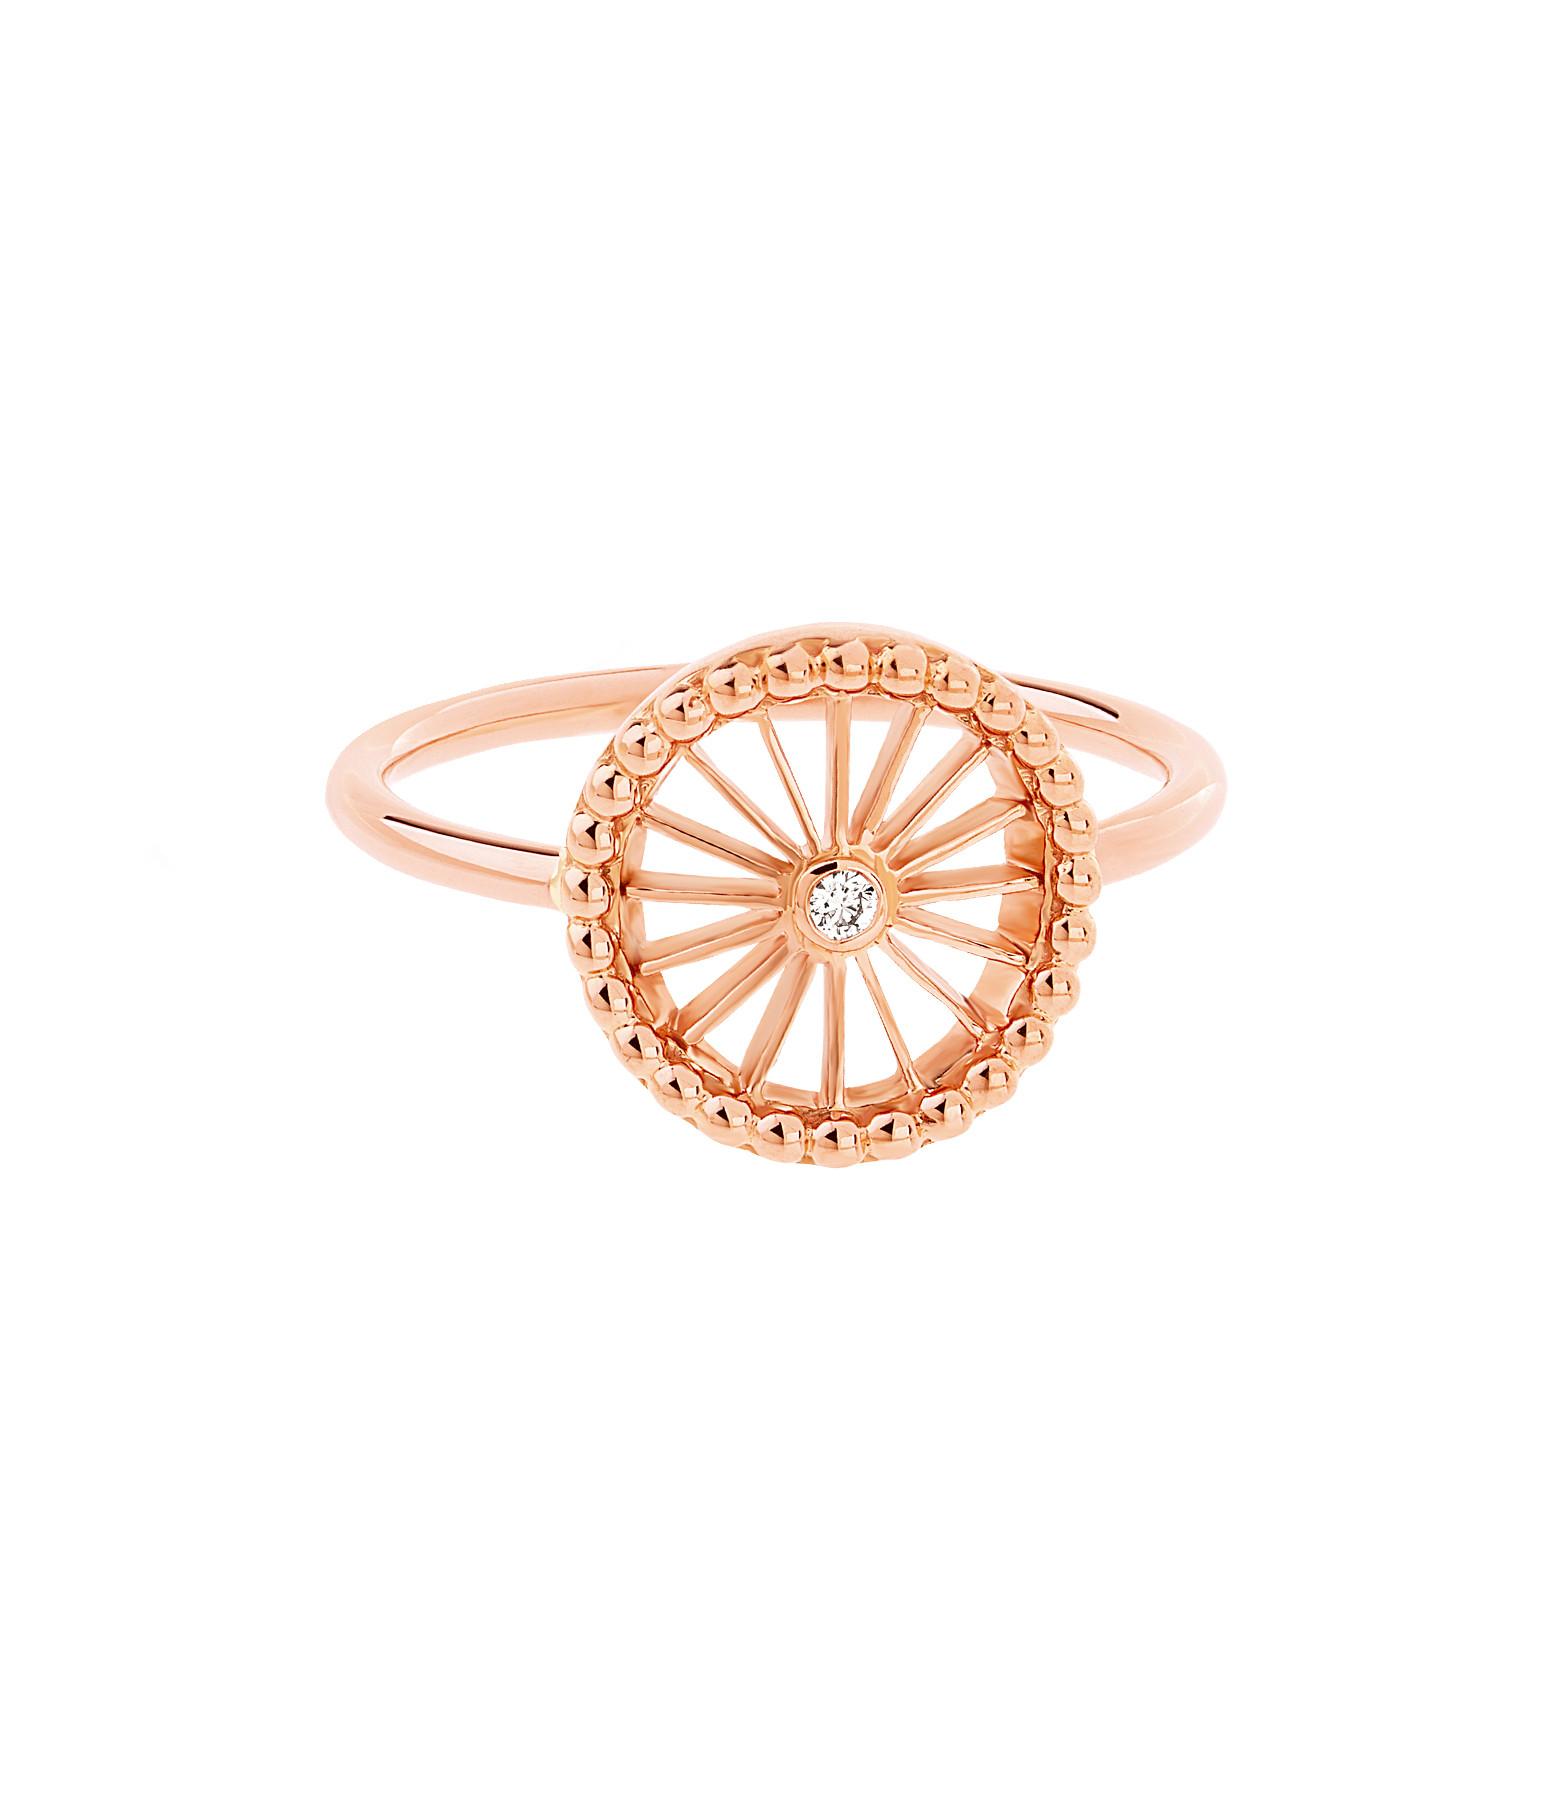 NAVA JOAILLERIE - Bague Mini-Cheyenne Ronde Diamants Or Rose